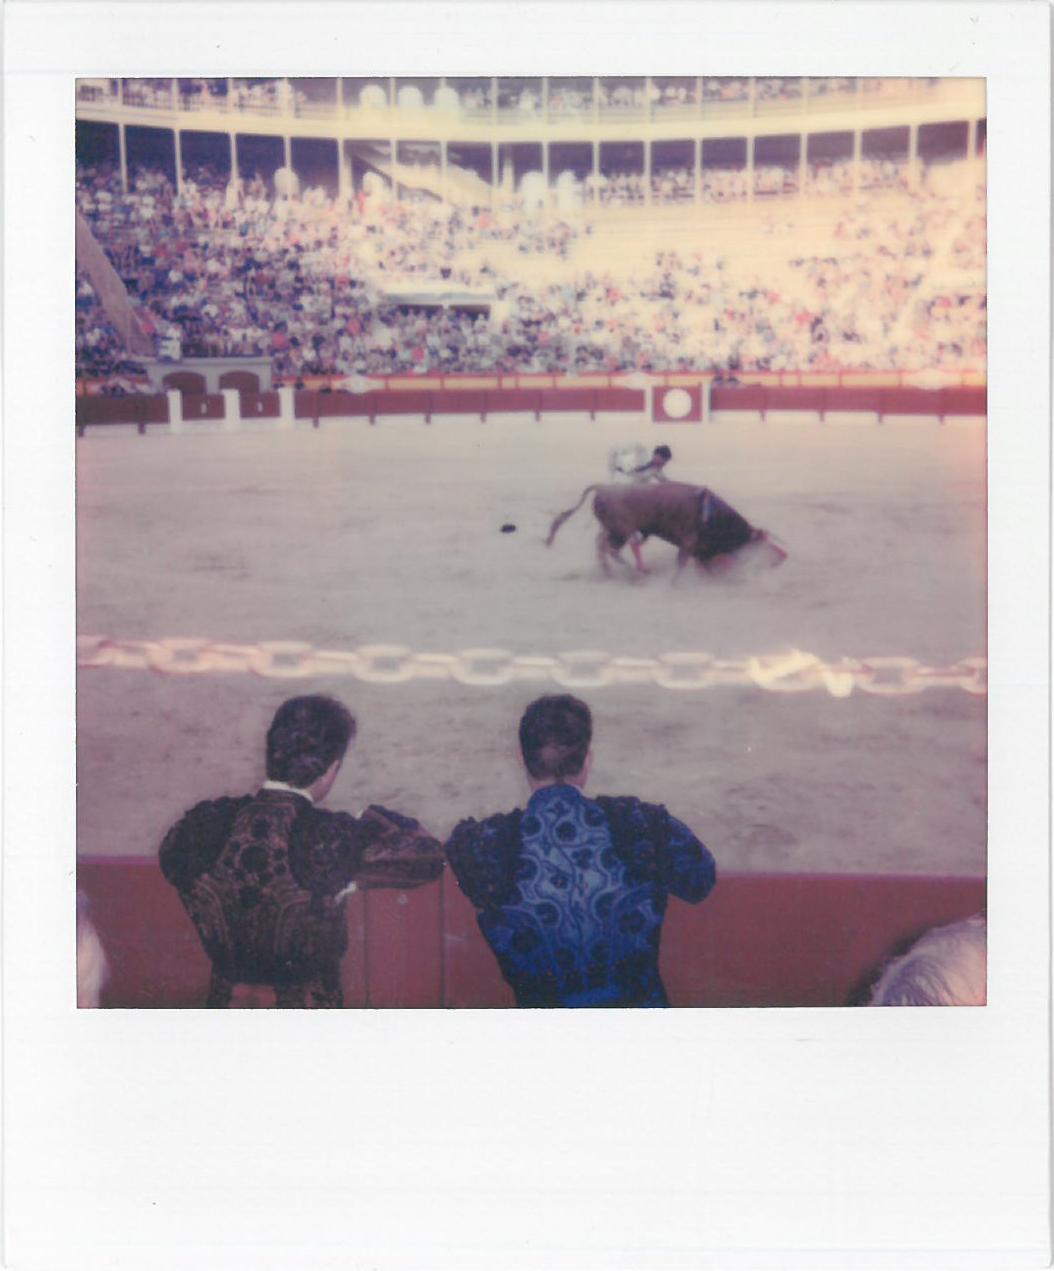 Davide_Spiridione_Alicante16